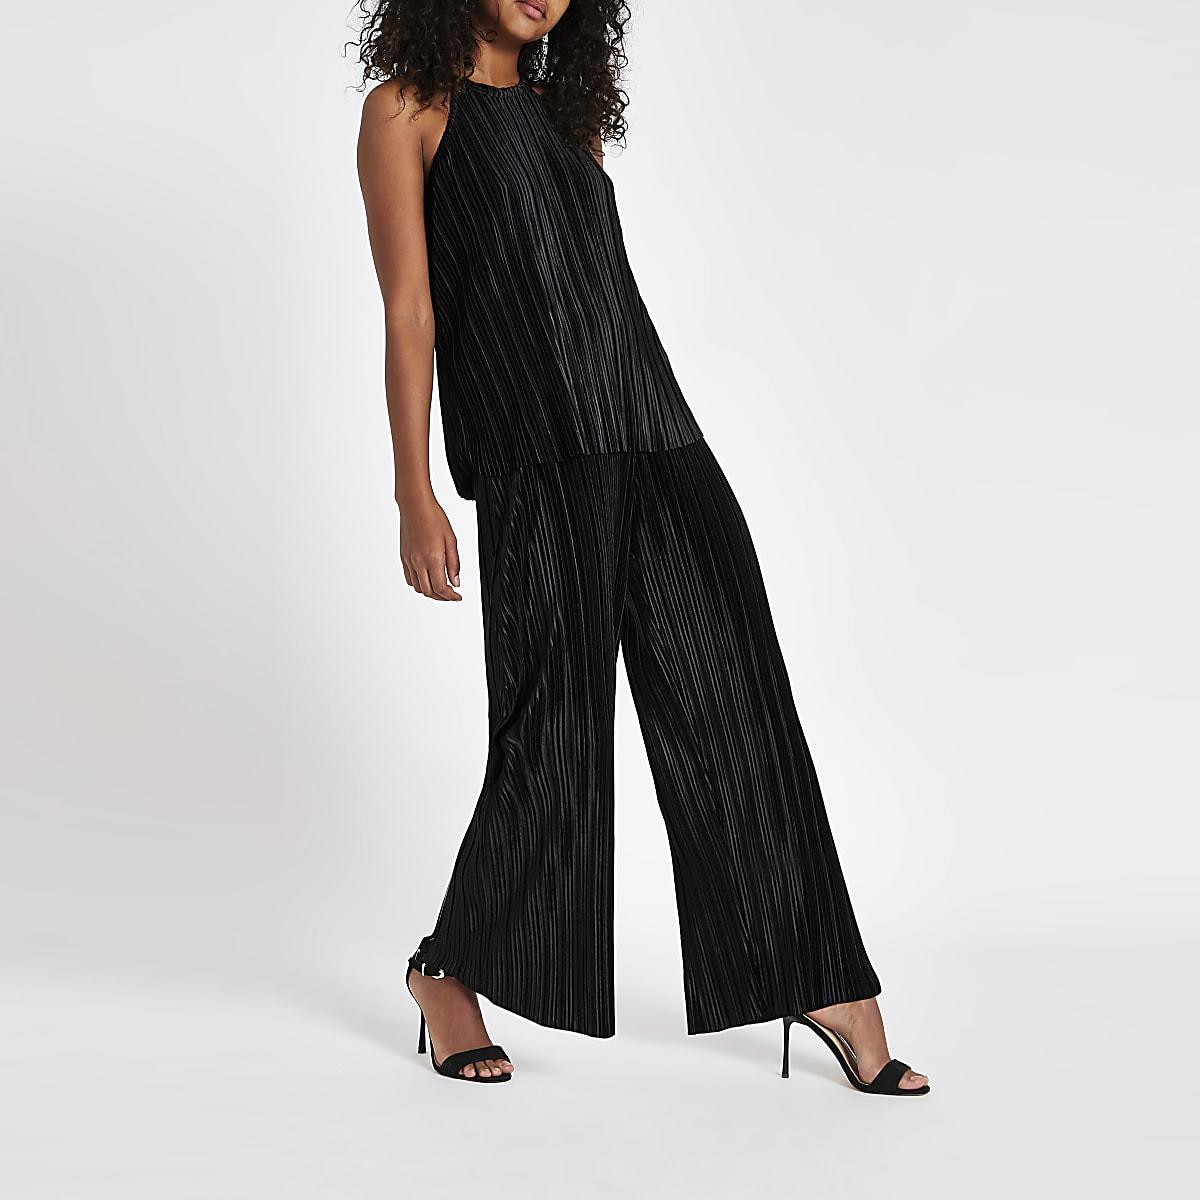 Zwarte fluwelen plissé mouwloze top